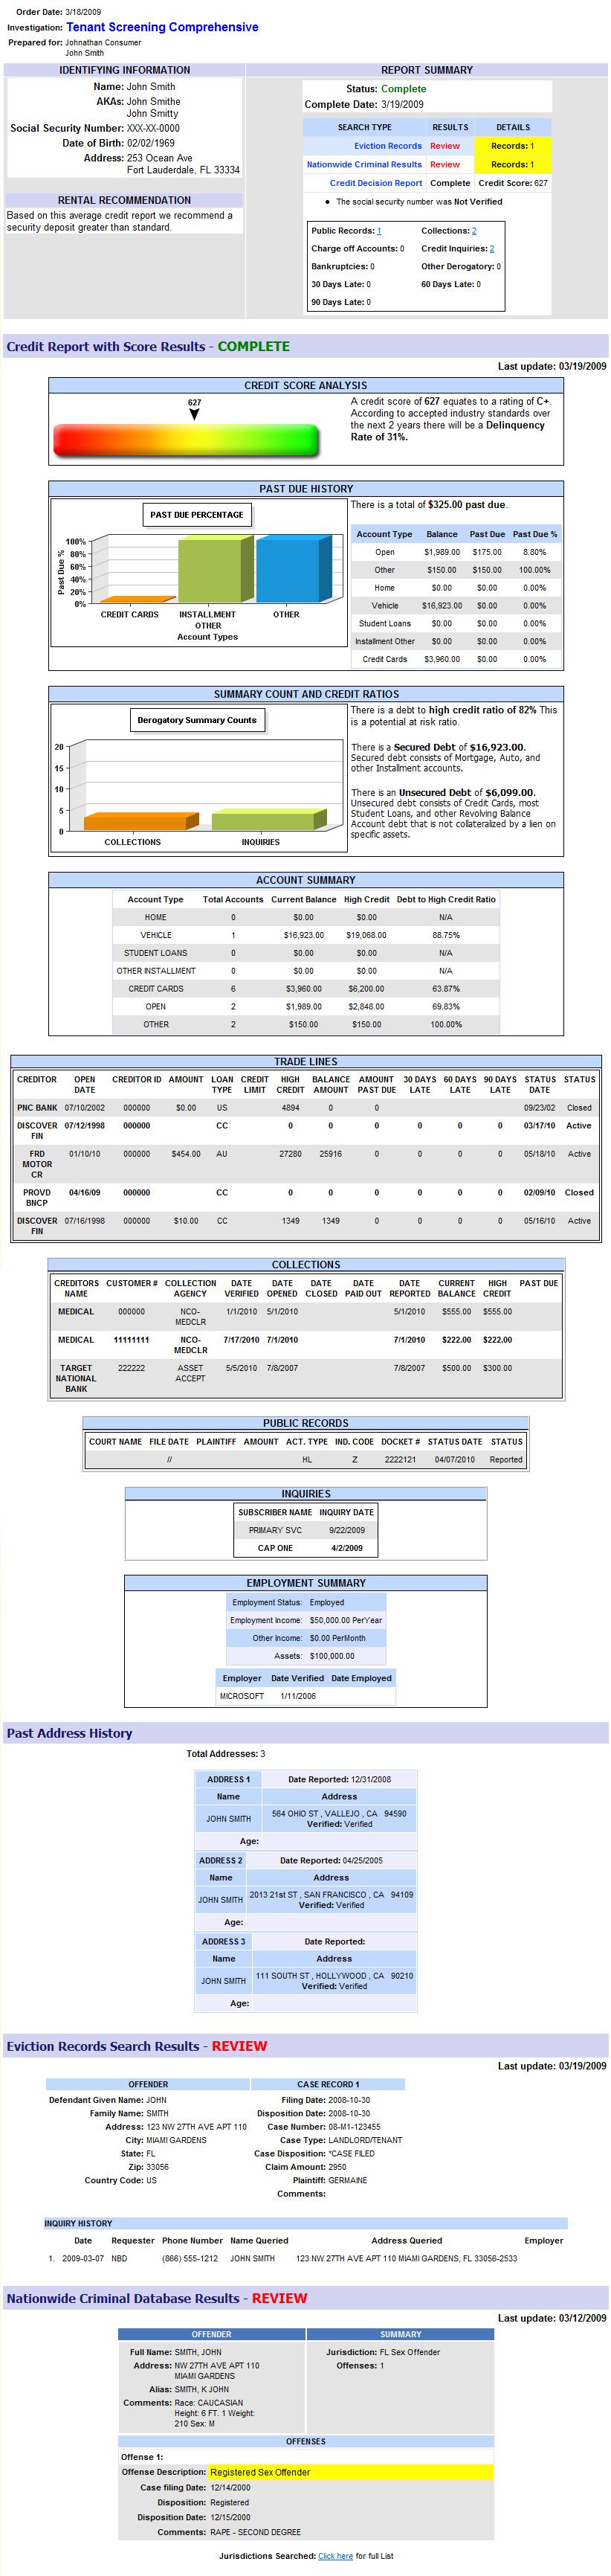 Bcg vs bain vs mckinsey report